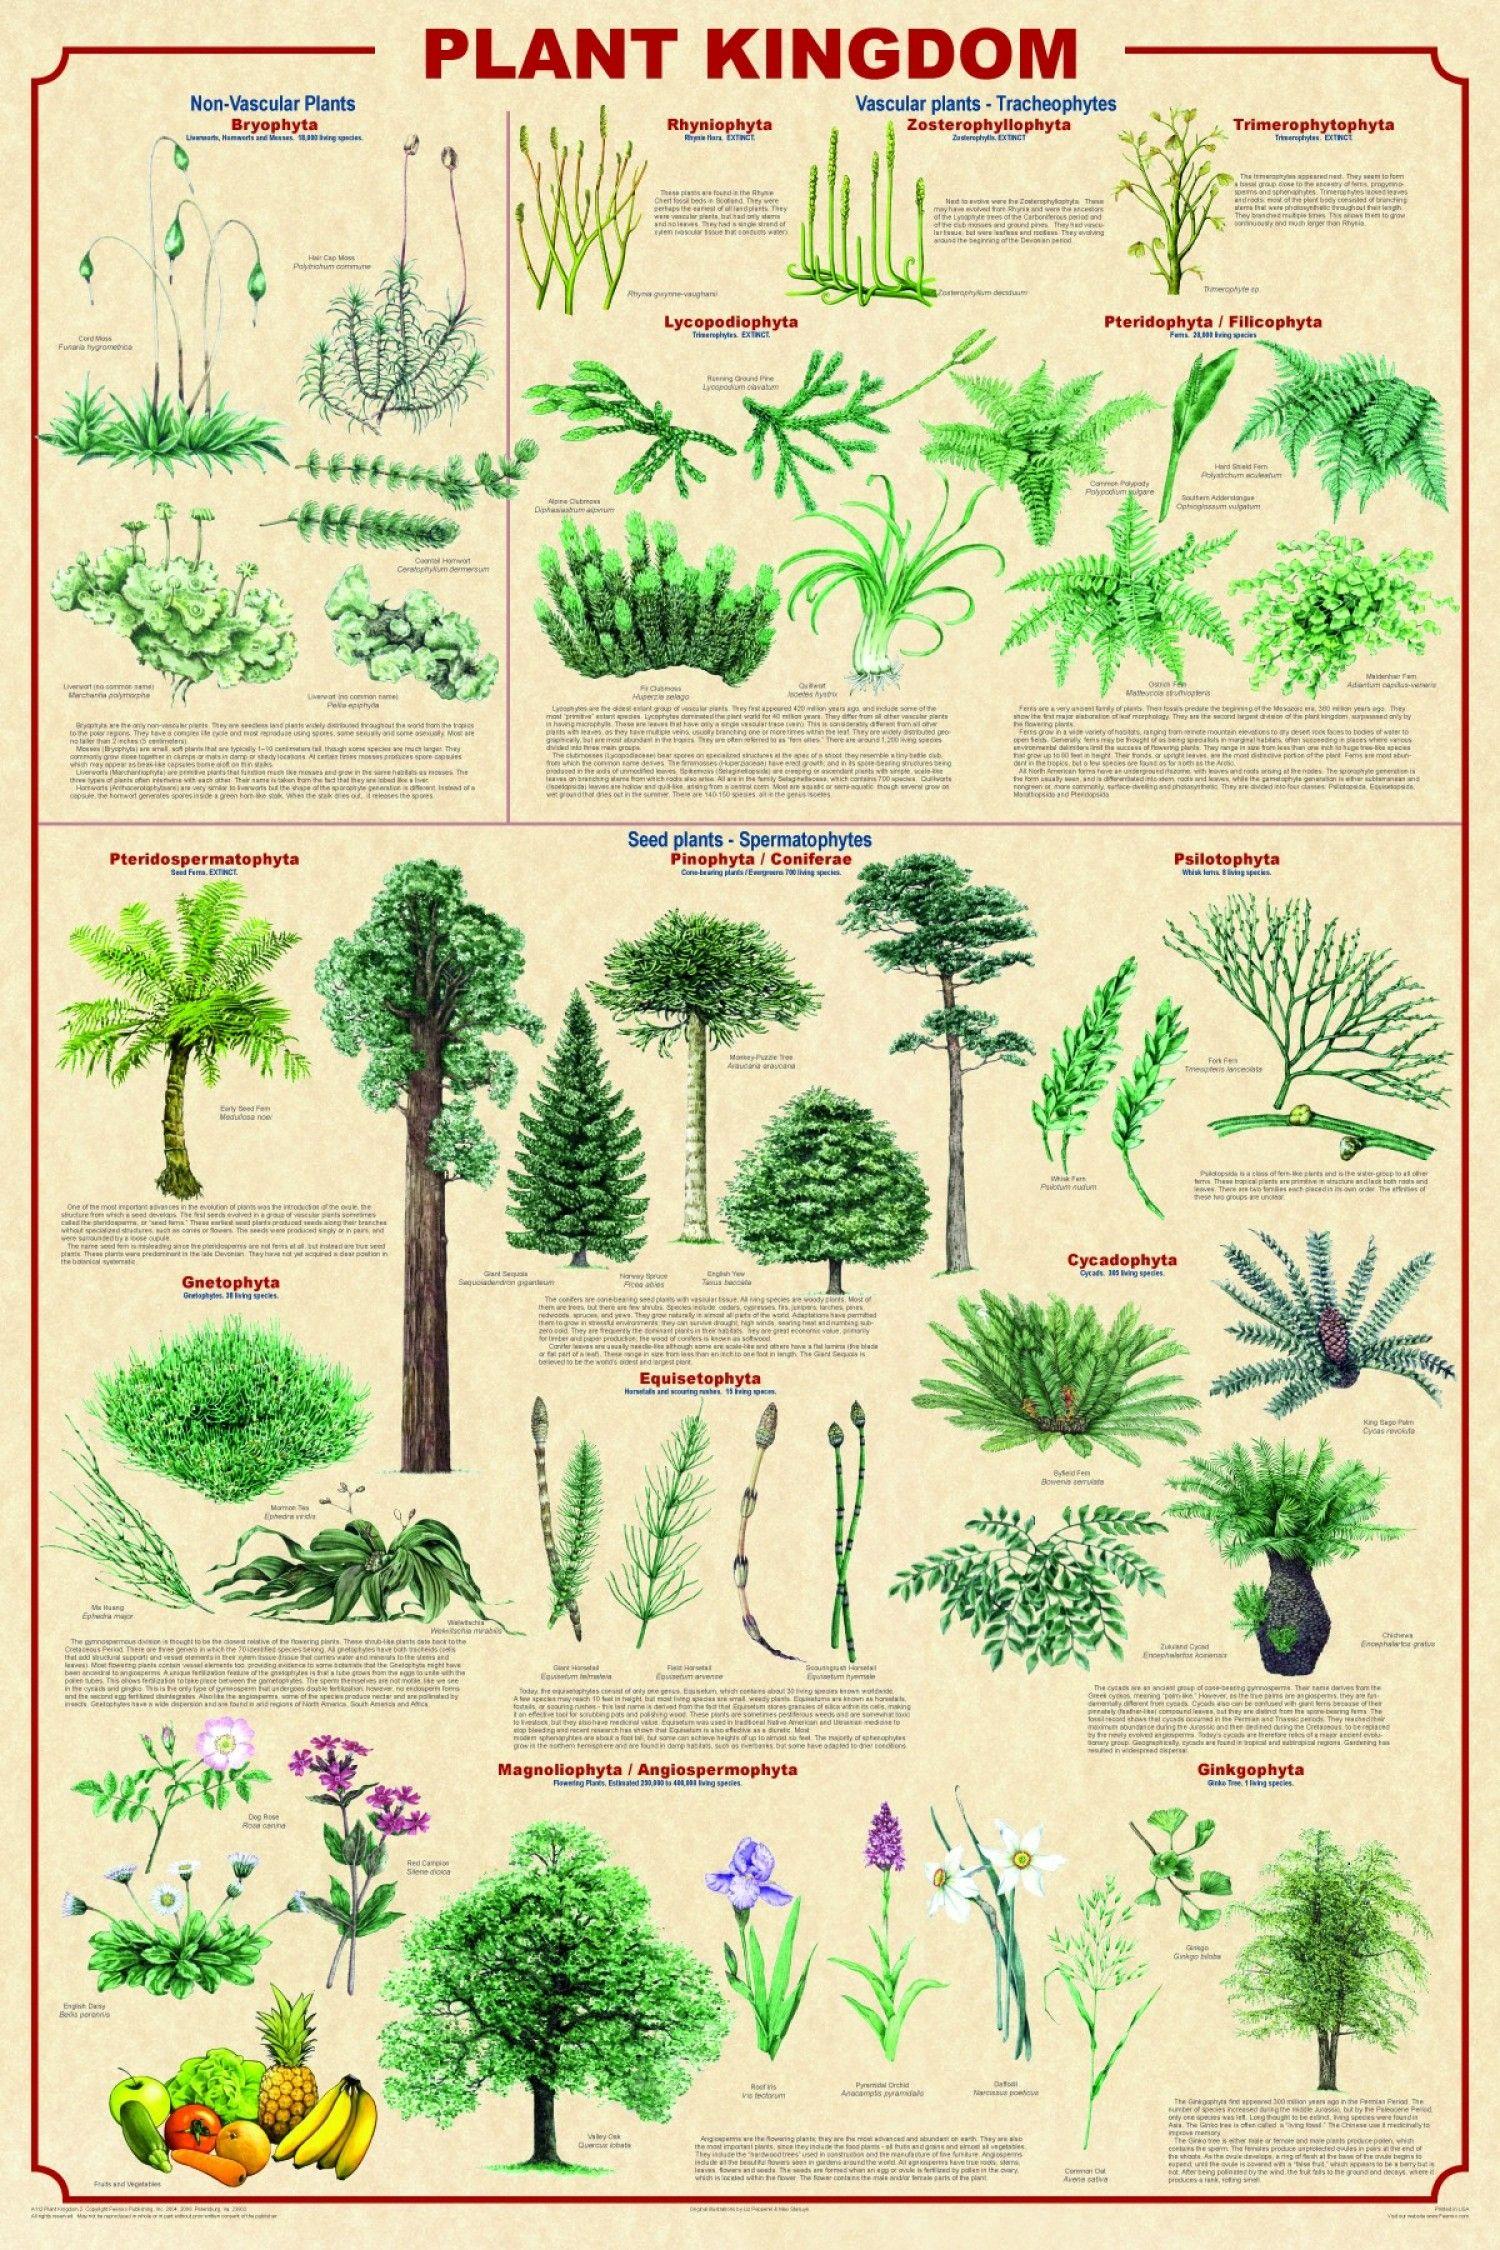 Plant Kingdom Infographic